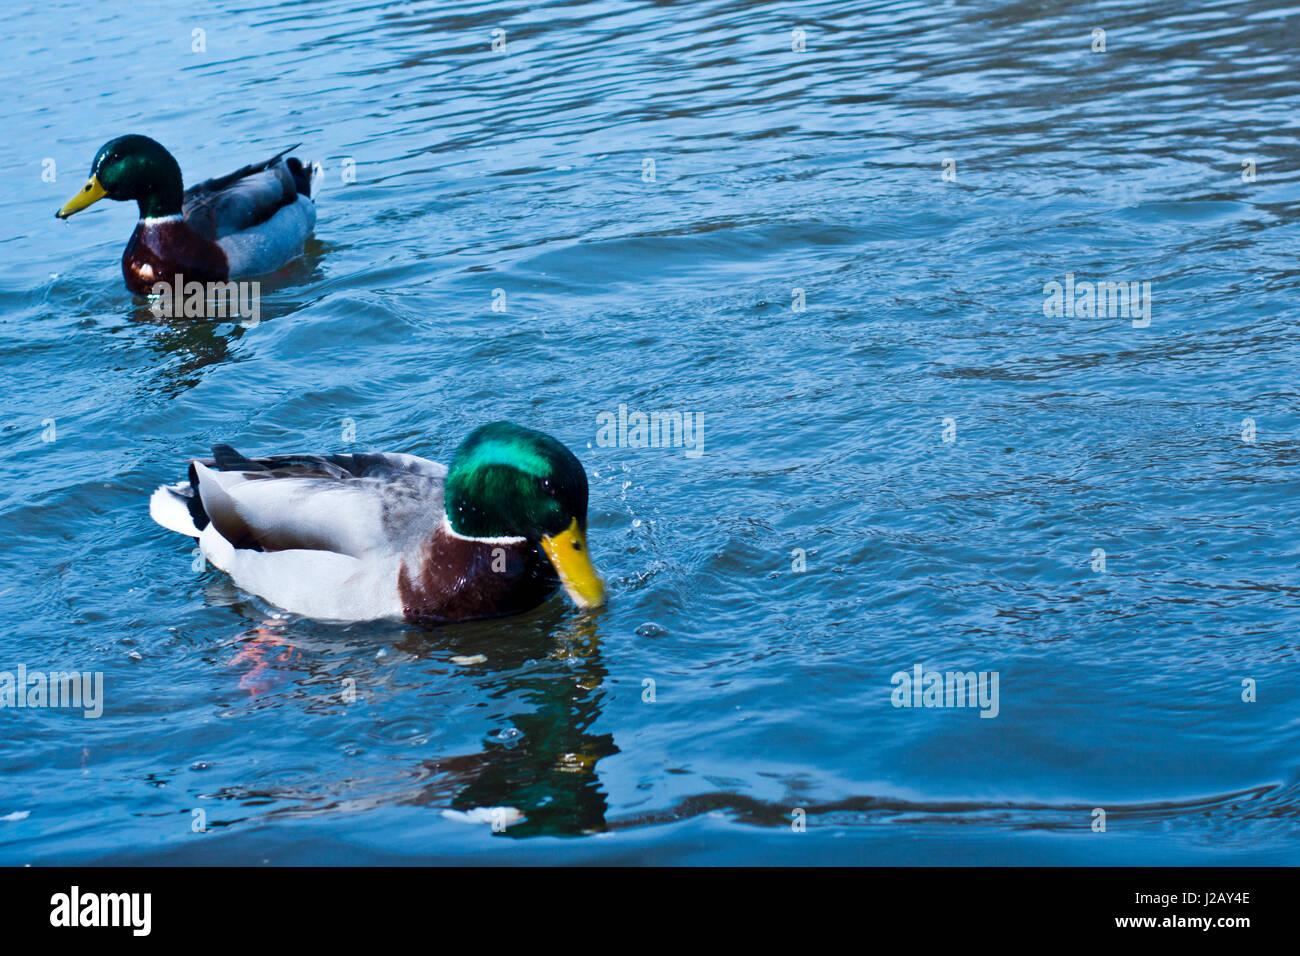 Mallard ducks swimming in a river - Stock Image